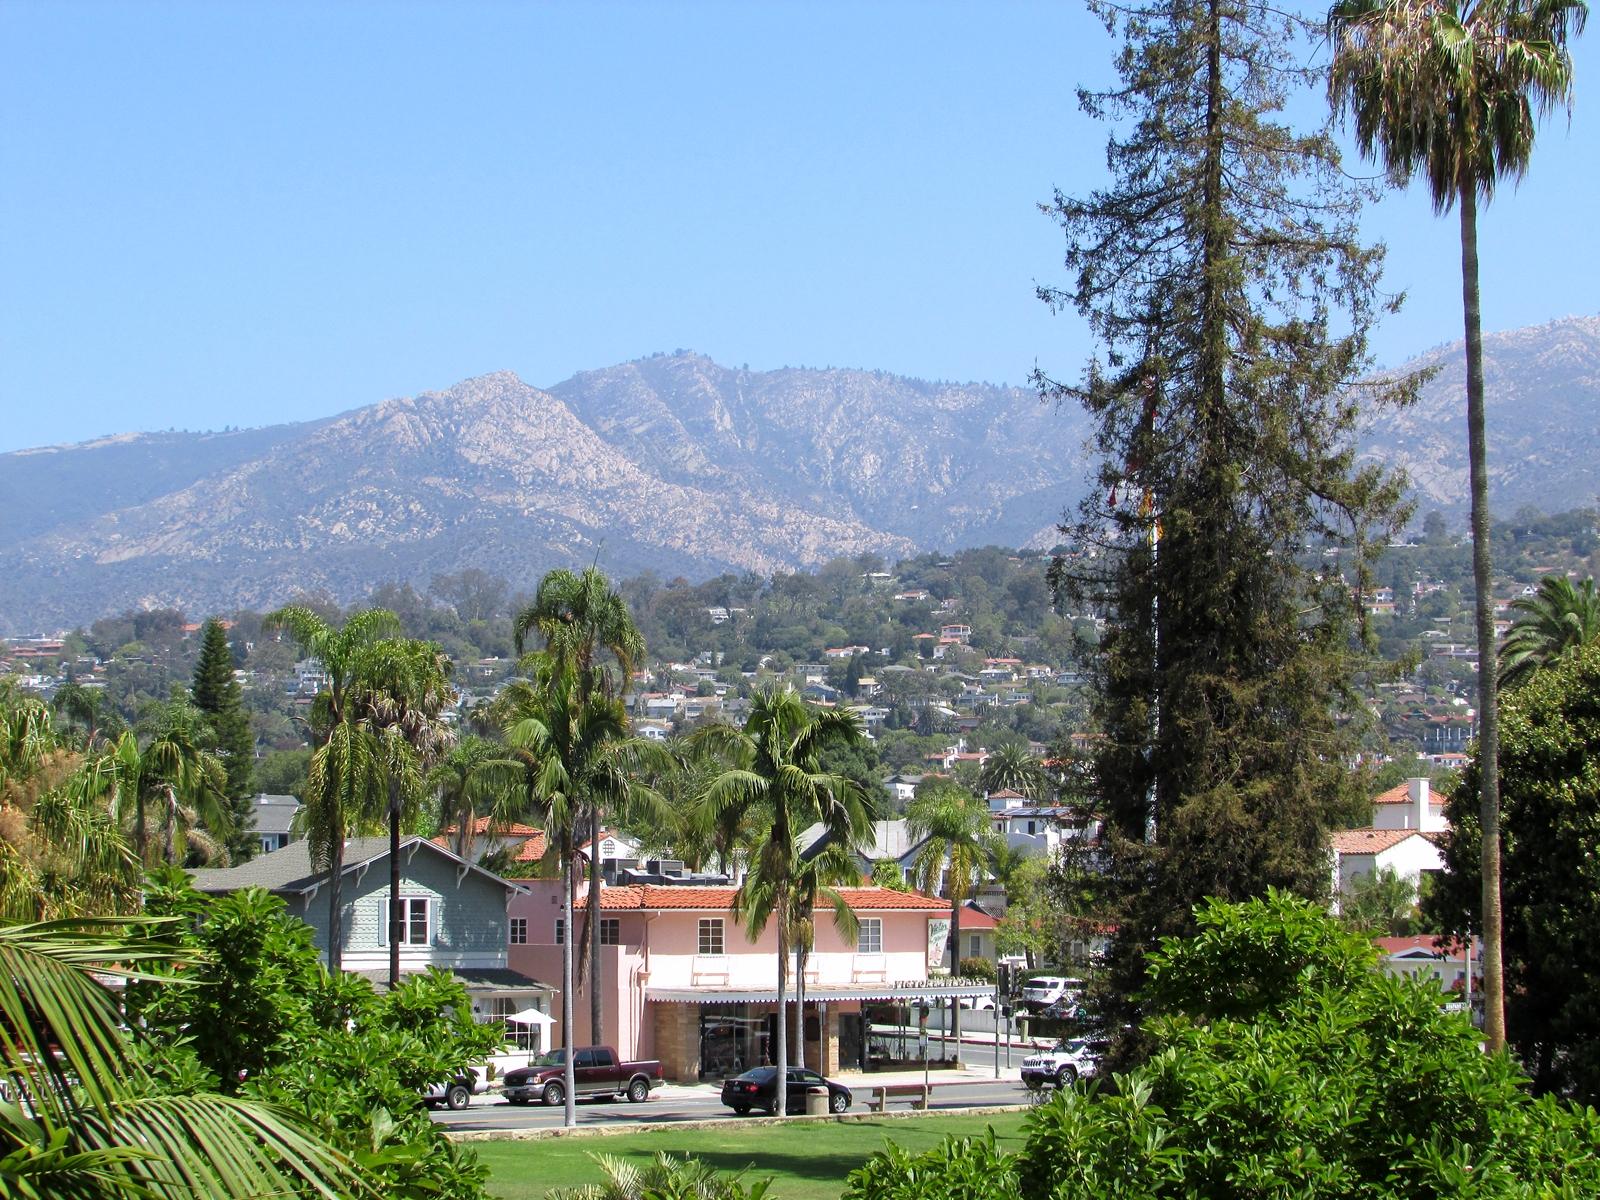 USA Rundreise - Amerika Westküste - Santa Barbara - County Courthouse - Fashionladyloves by Tamara Wagner